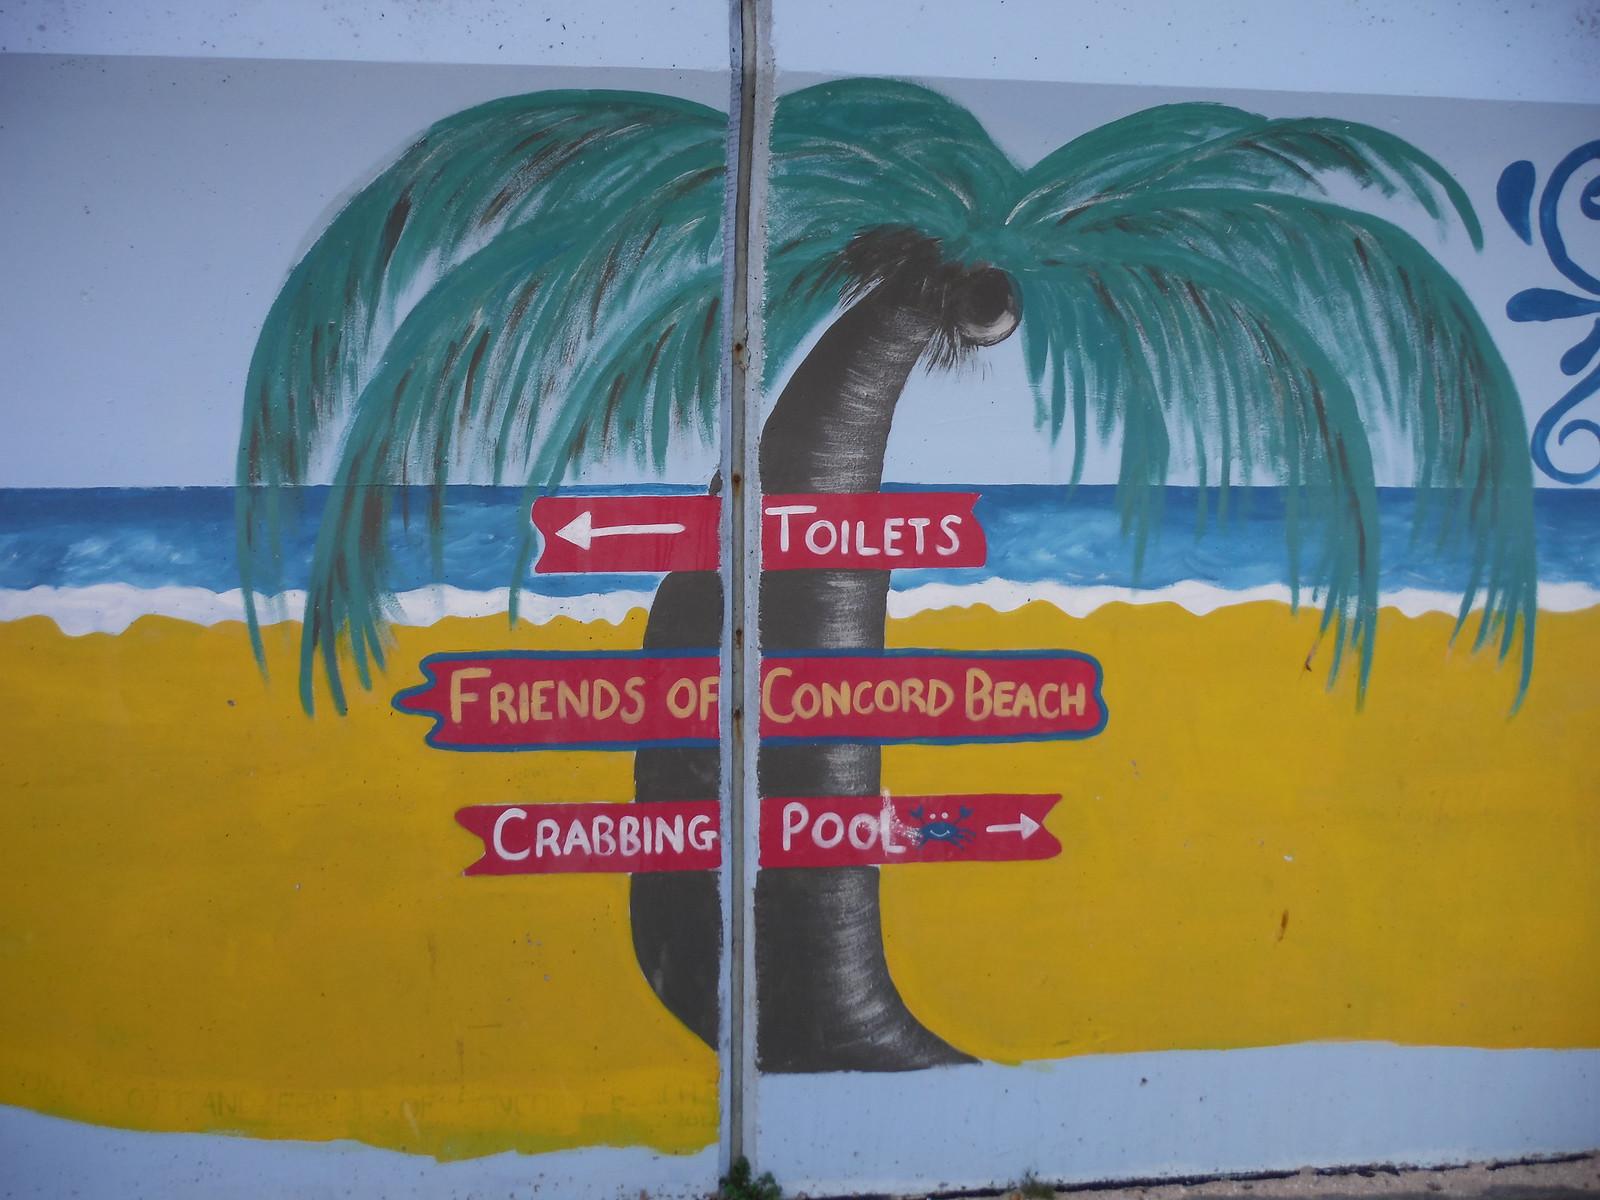 Concord Beach mural, Concord Beach, Canvey Island SWC Walk 258 Benfleet Circular (via Canvey Island)